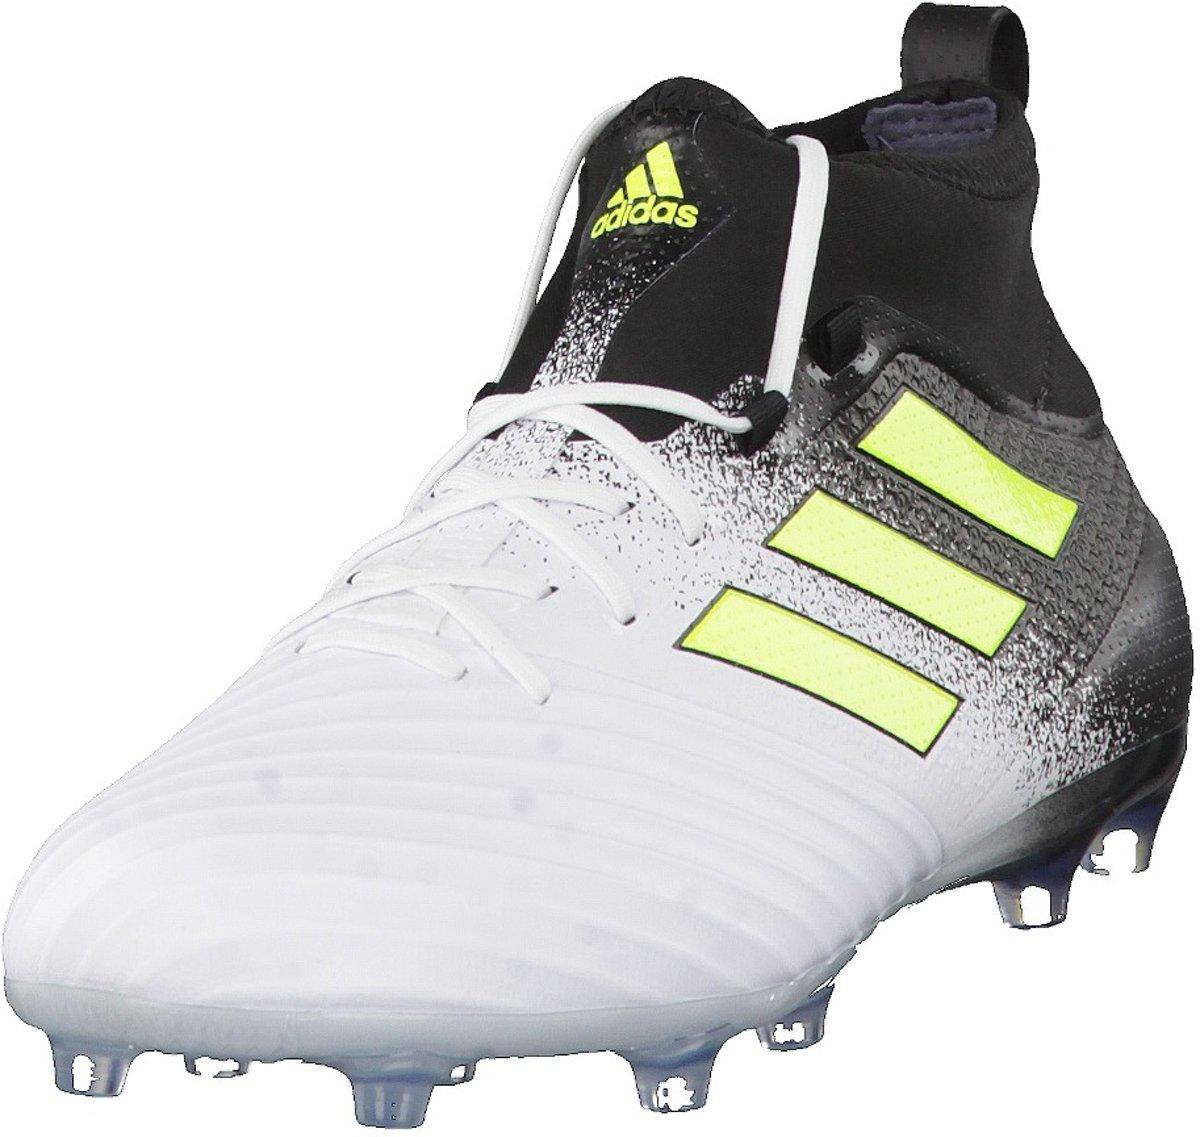 Adidas Performance Voetbalschoenen ACE 17.2 FG S77054